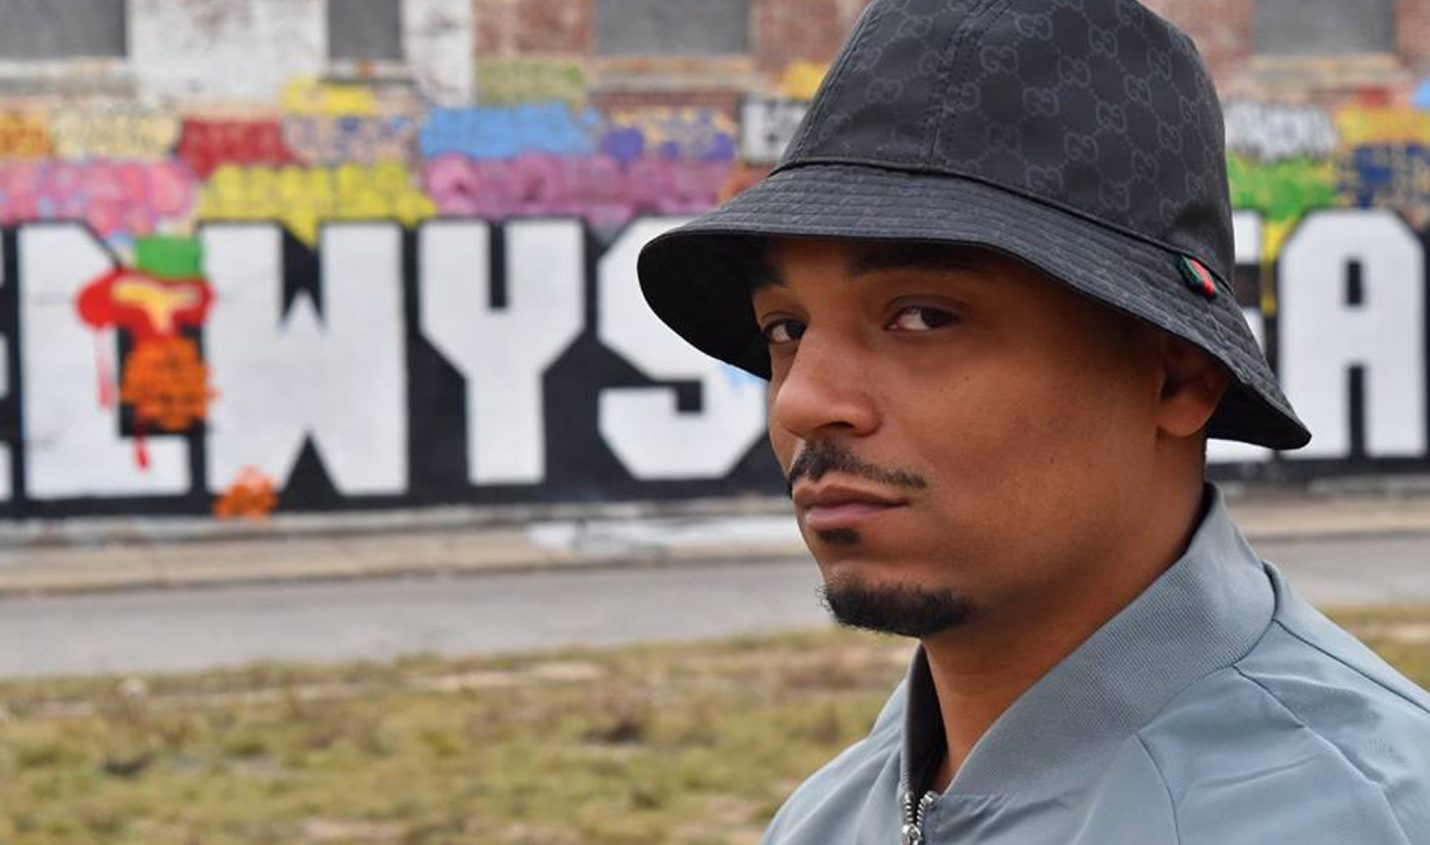 Omar-S: Neues Album 'Fuck Resident Advisor' angekündigt